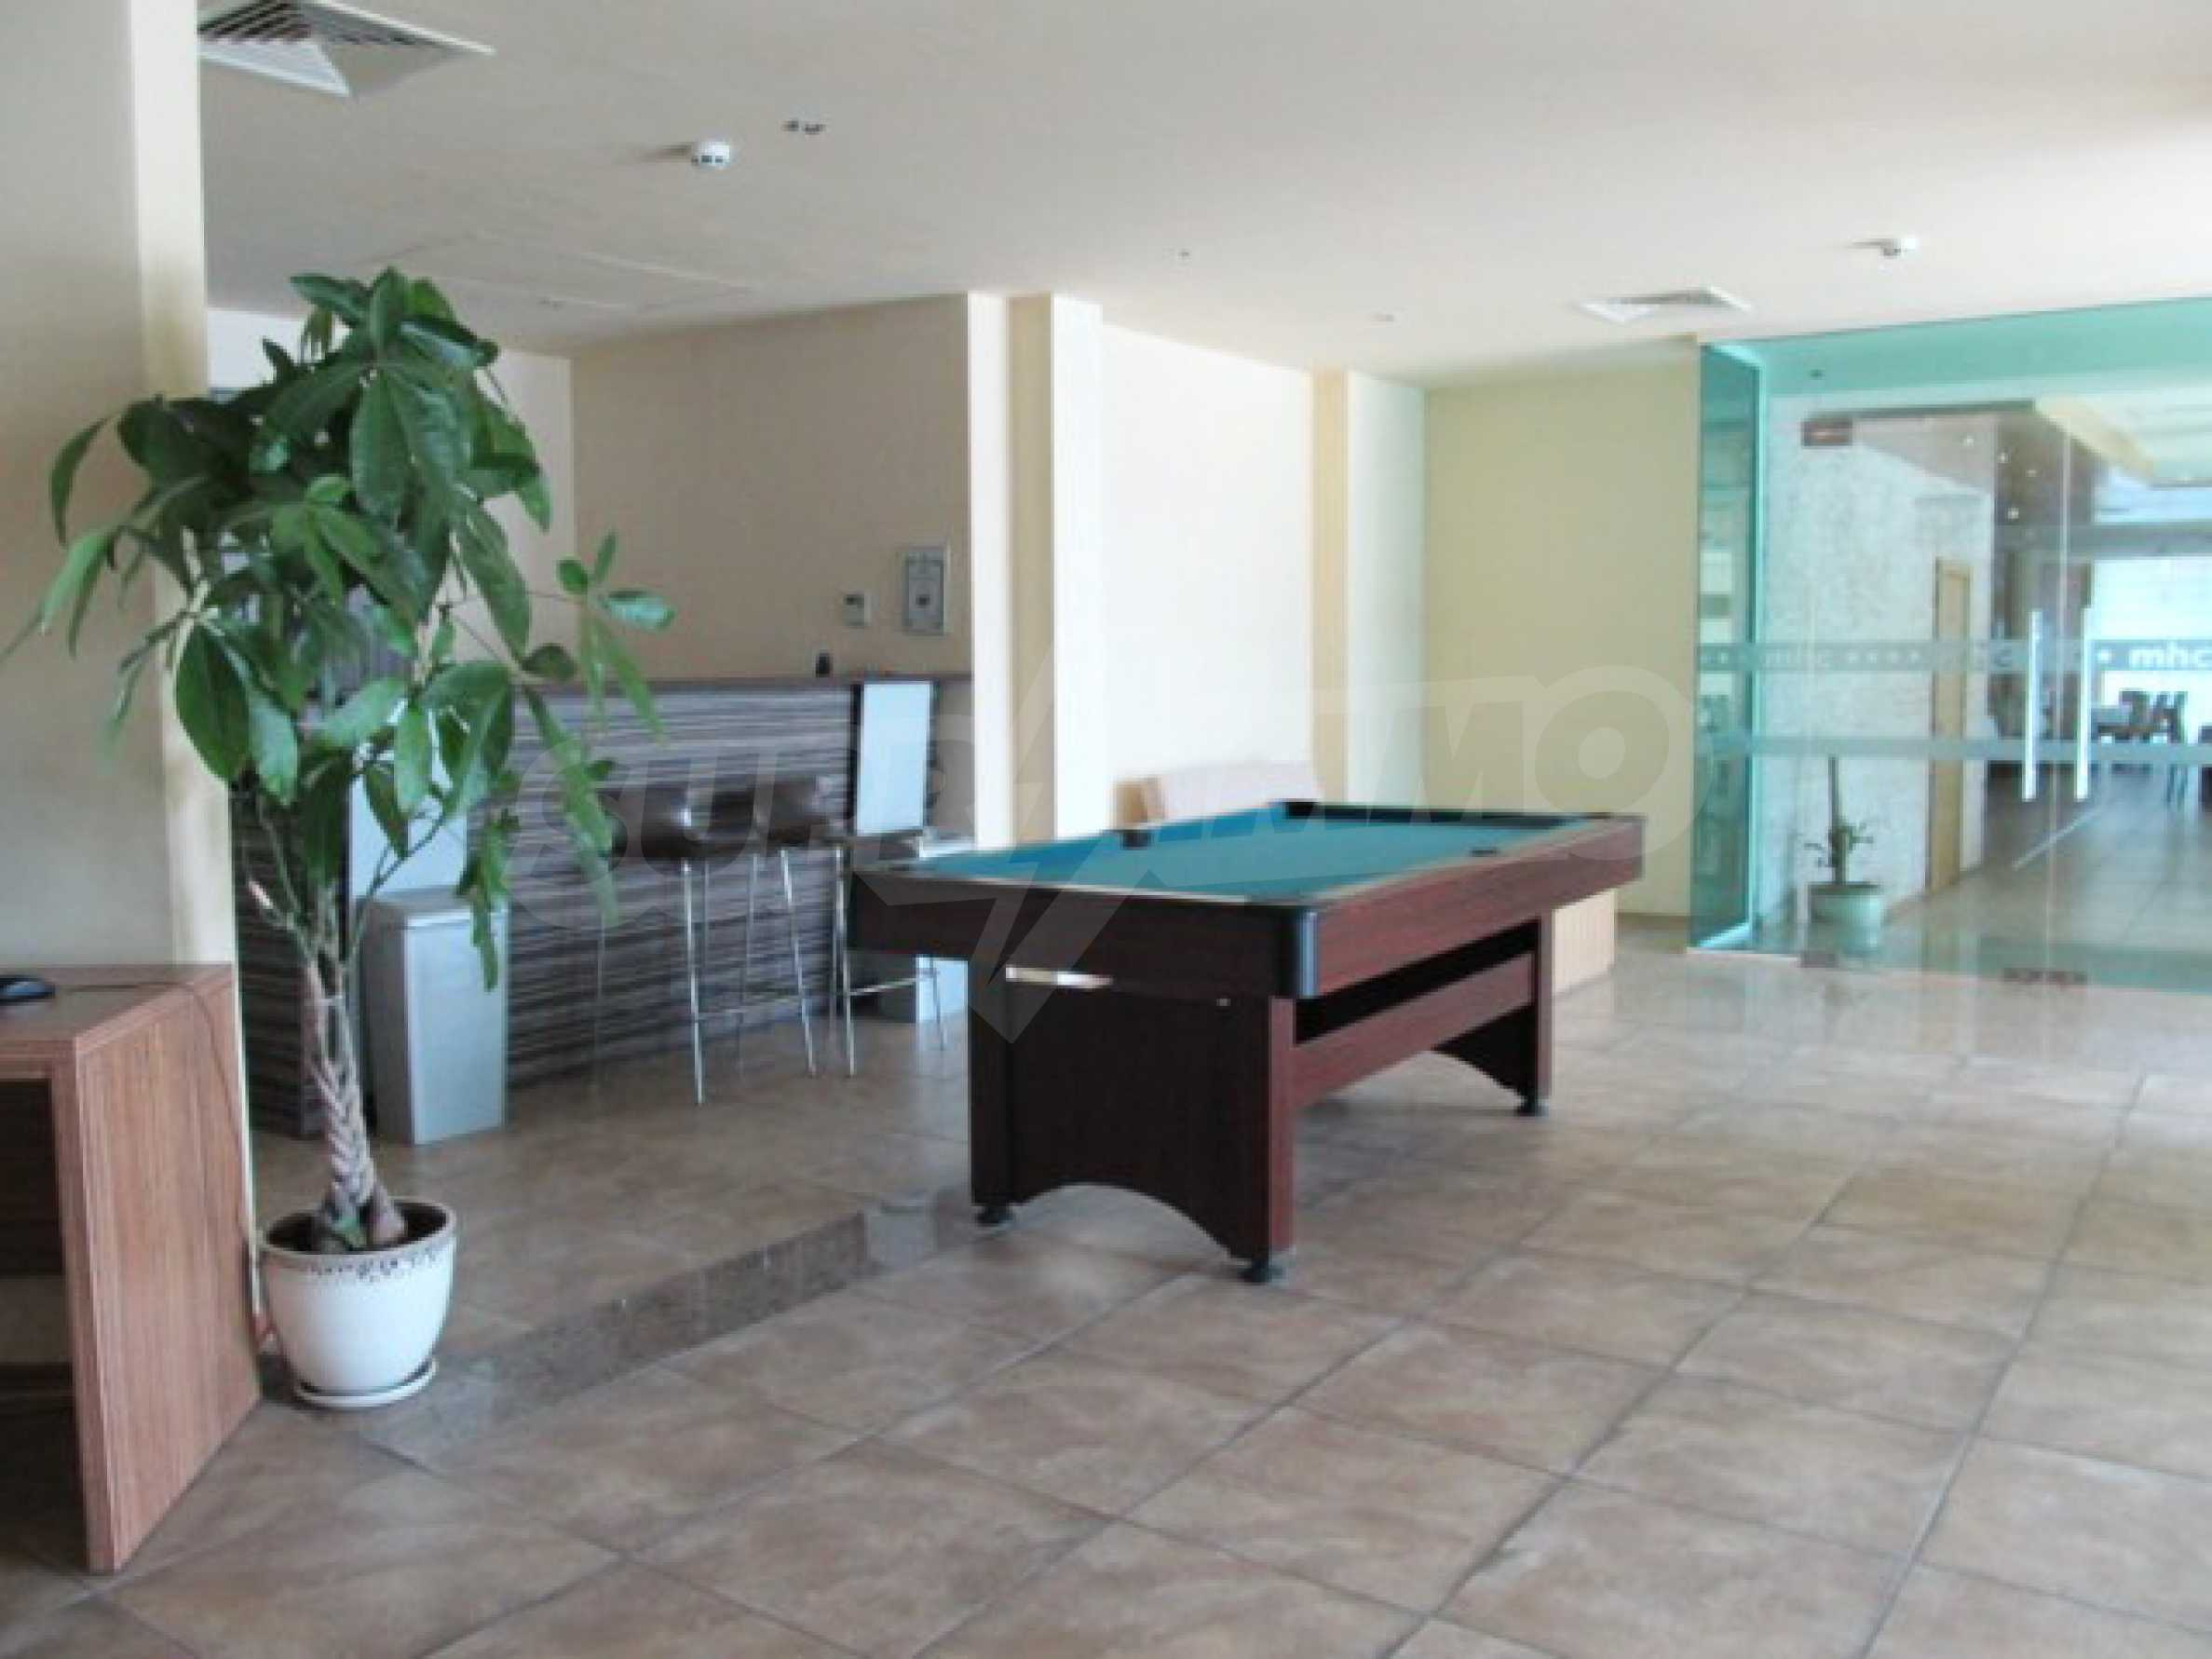 Тристаен апартамент за продажба в Поморие 4